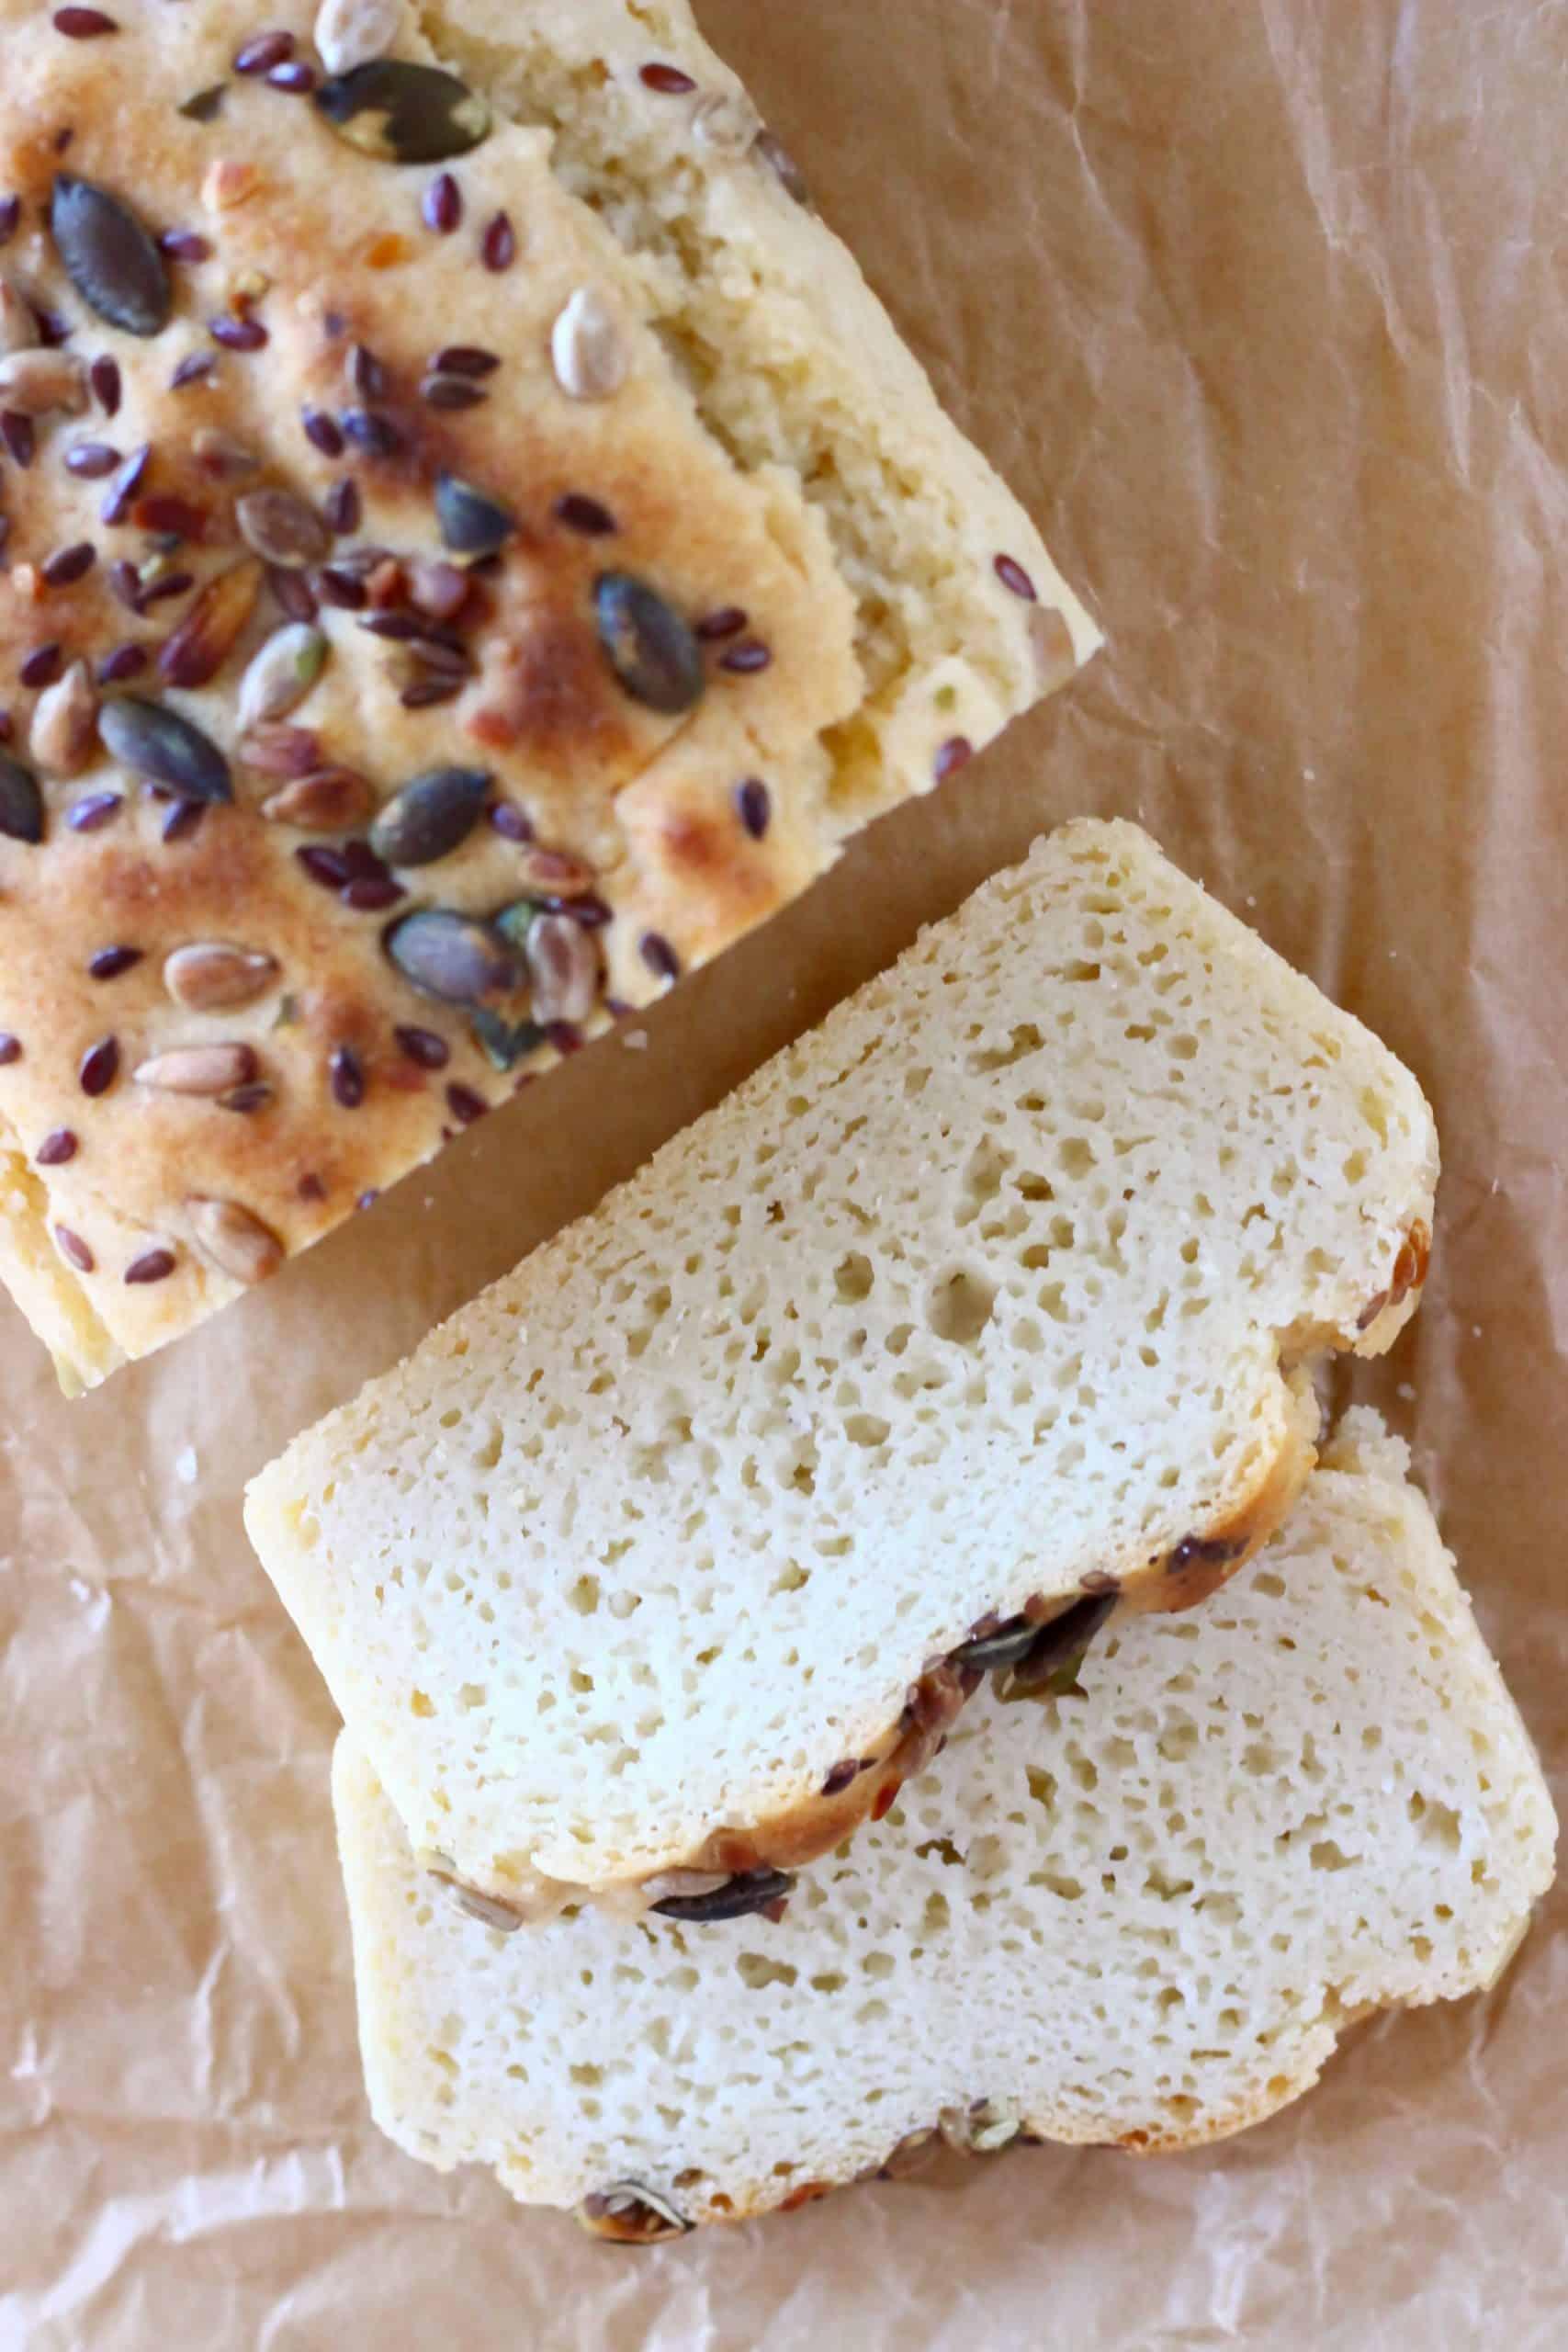 30 Gluten-Free Vegan Bread Recipes | Rhian's Recipes